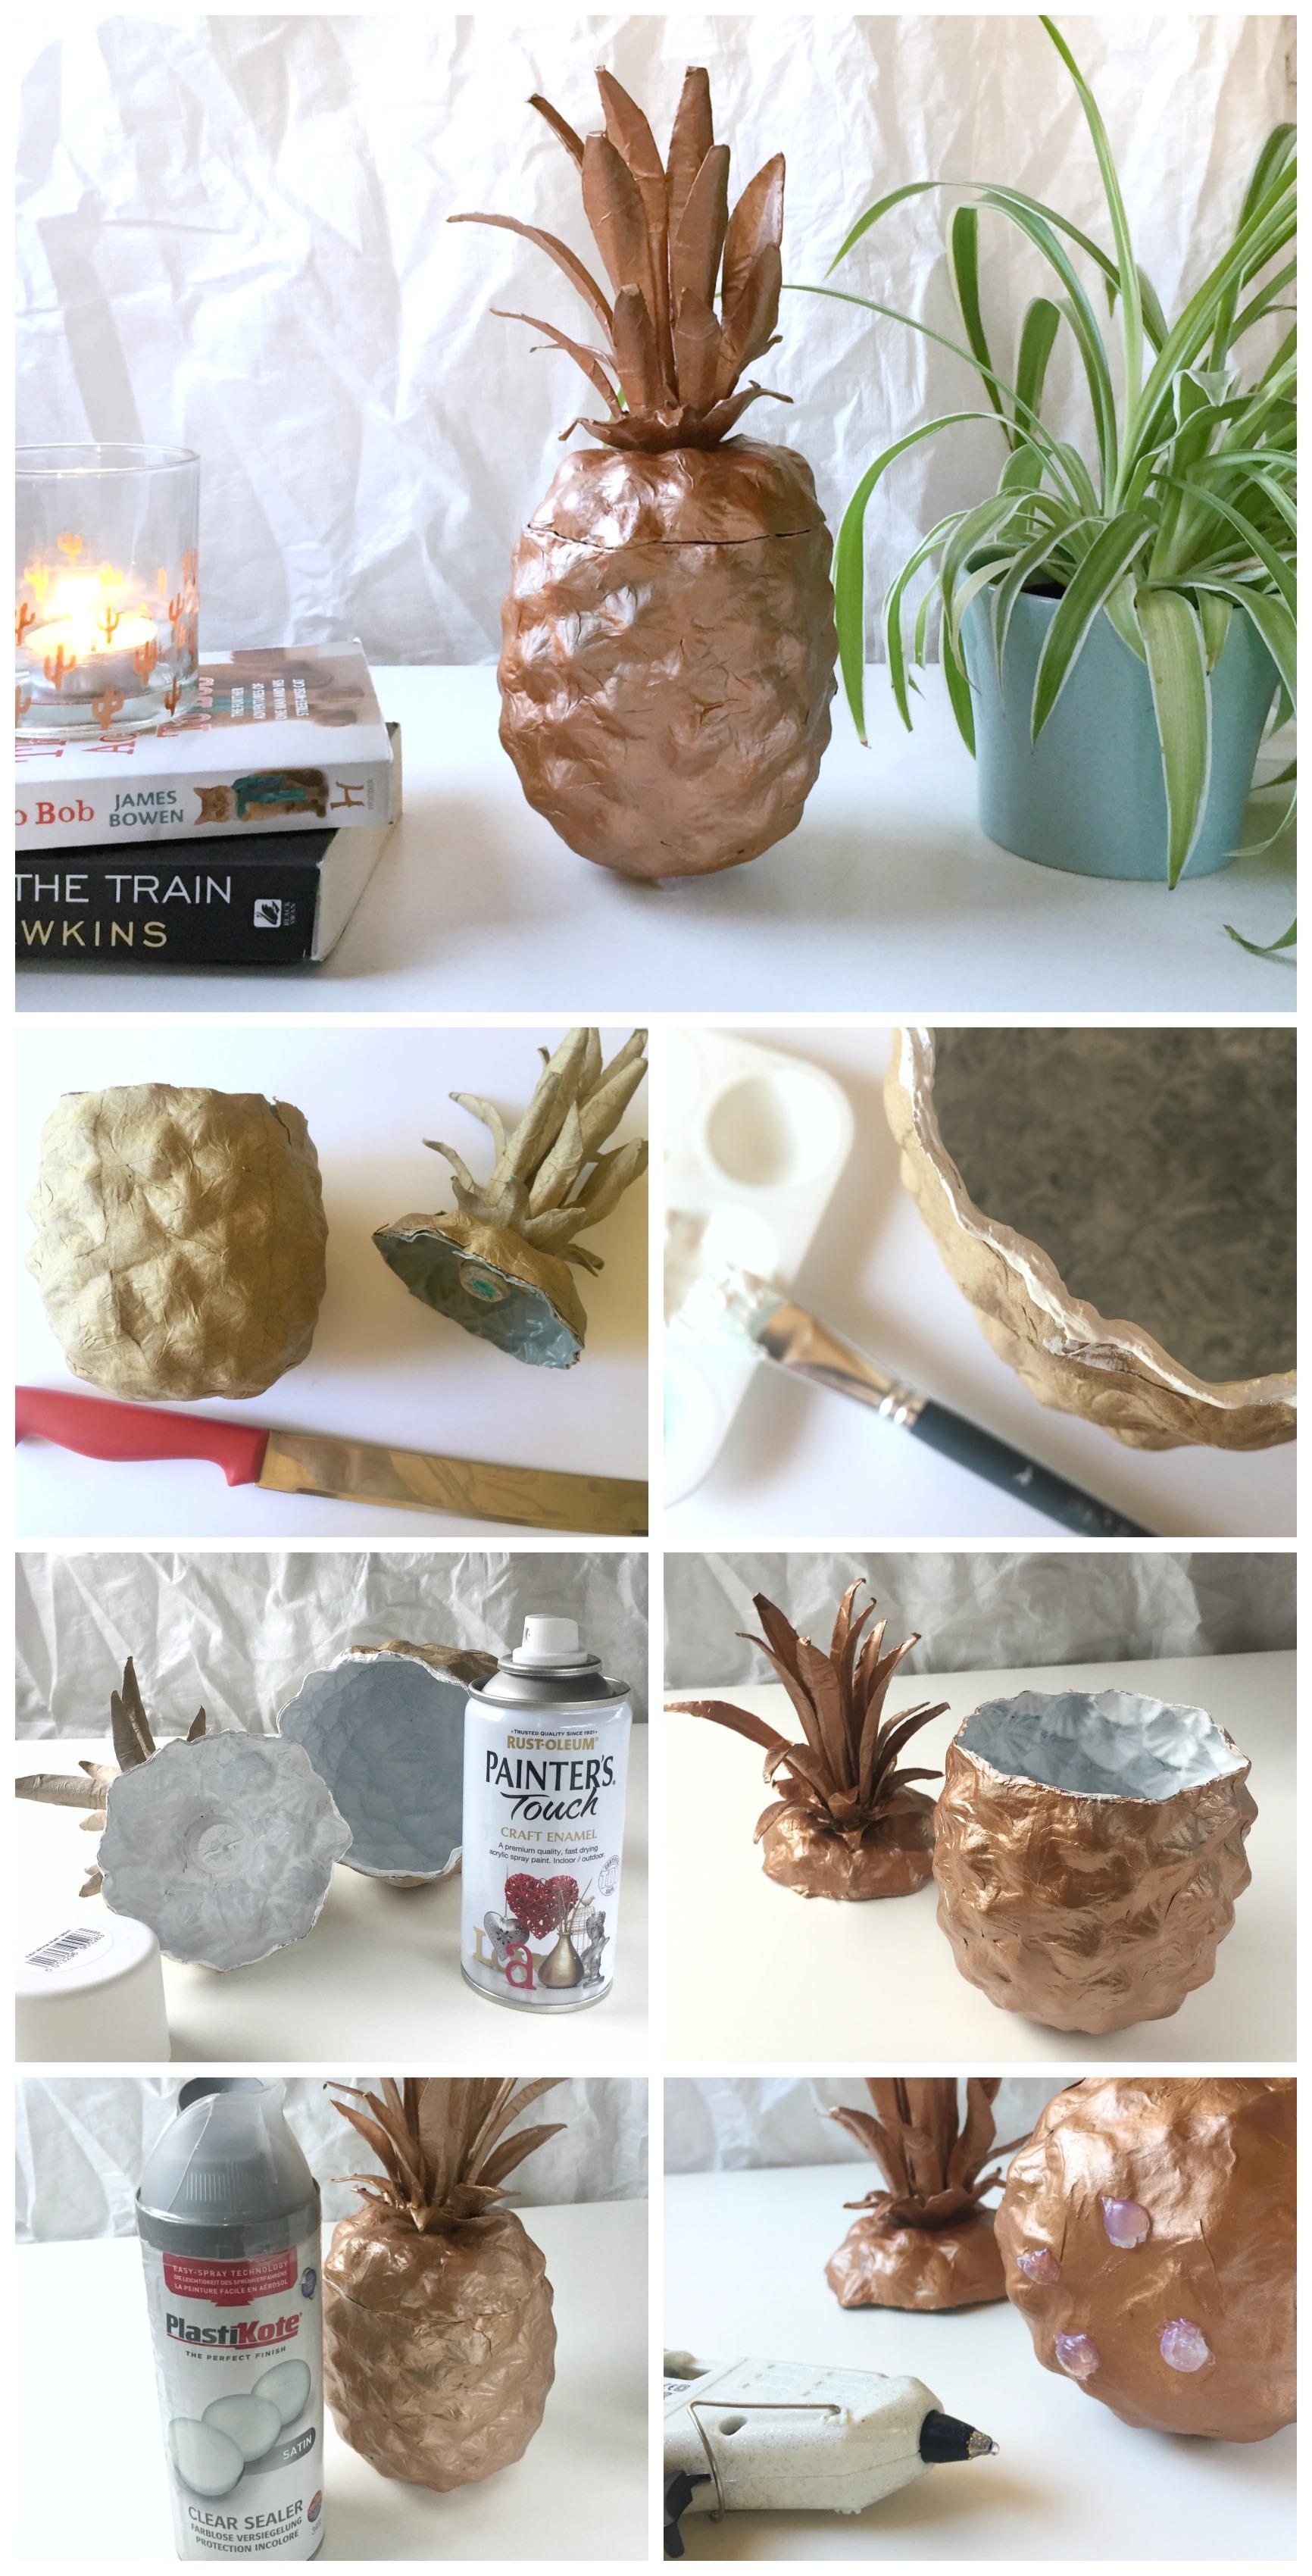 DIY Copper Pineapple Storage Pot by Isoscella